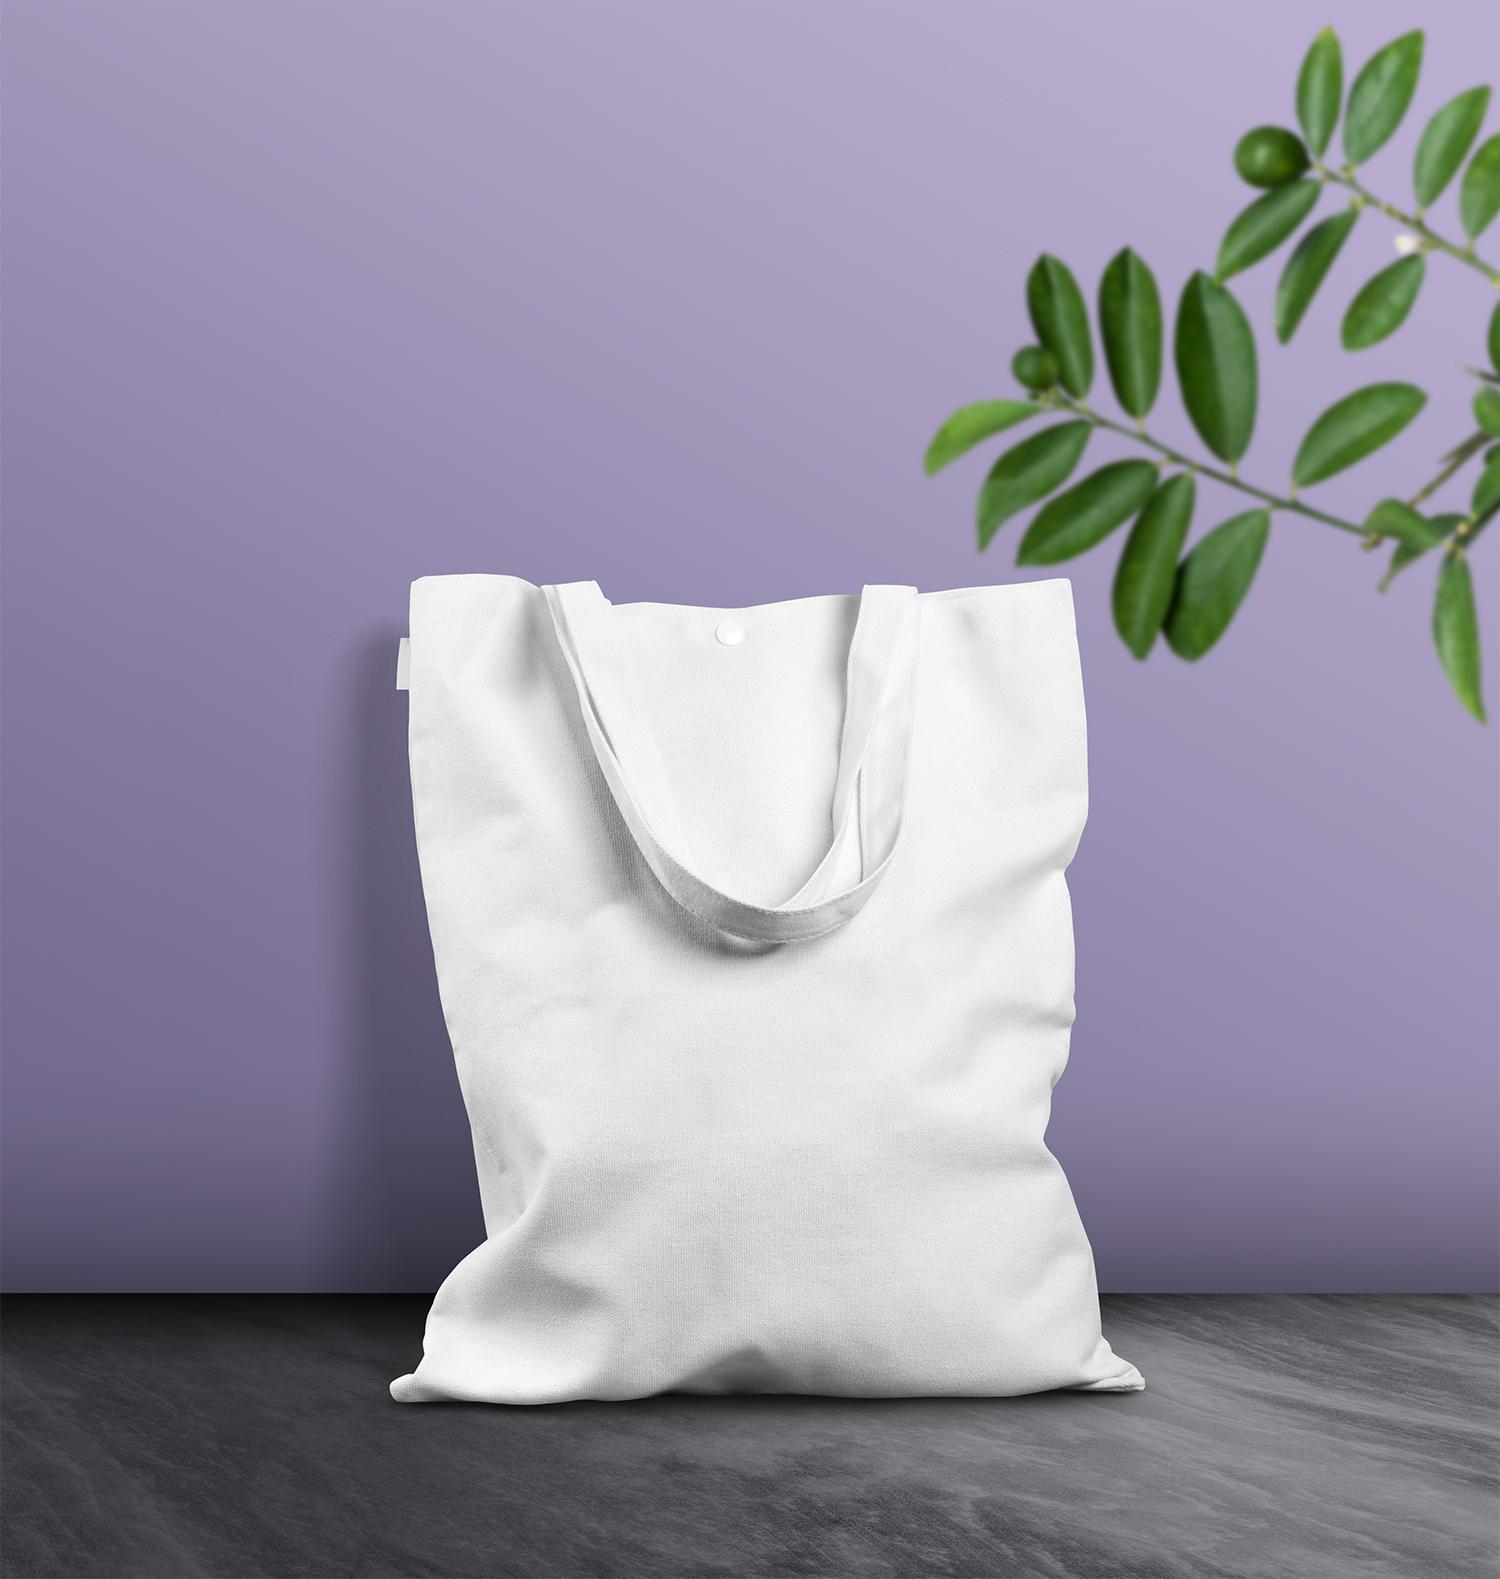 Free Canvas Bag Mockup